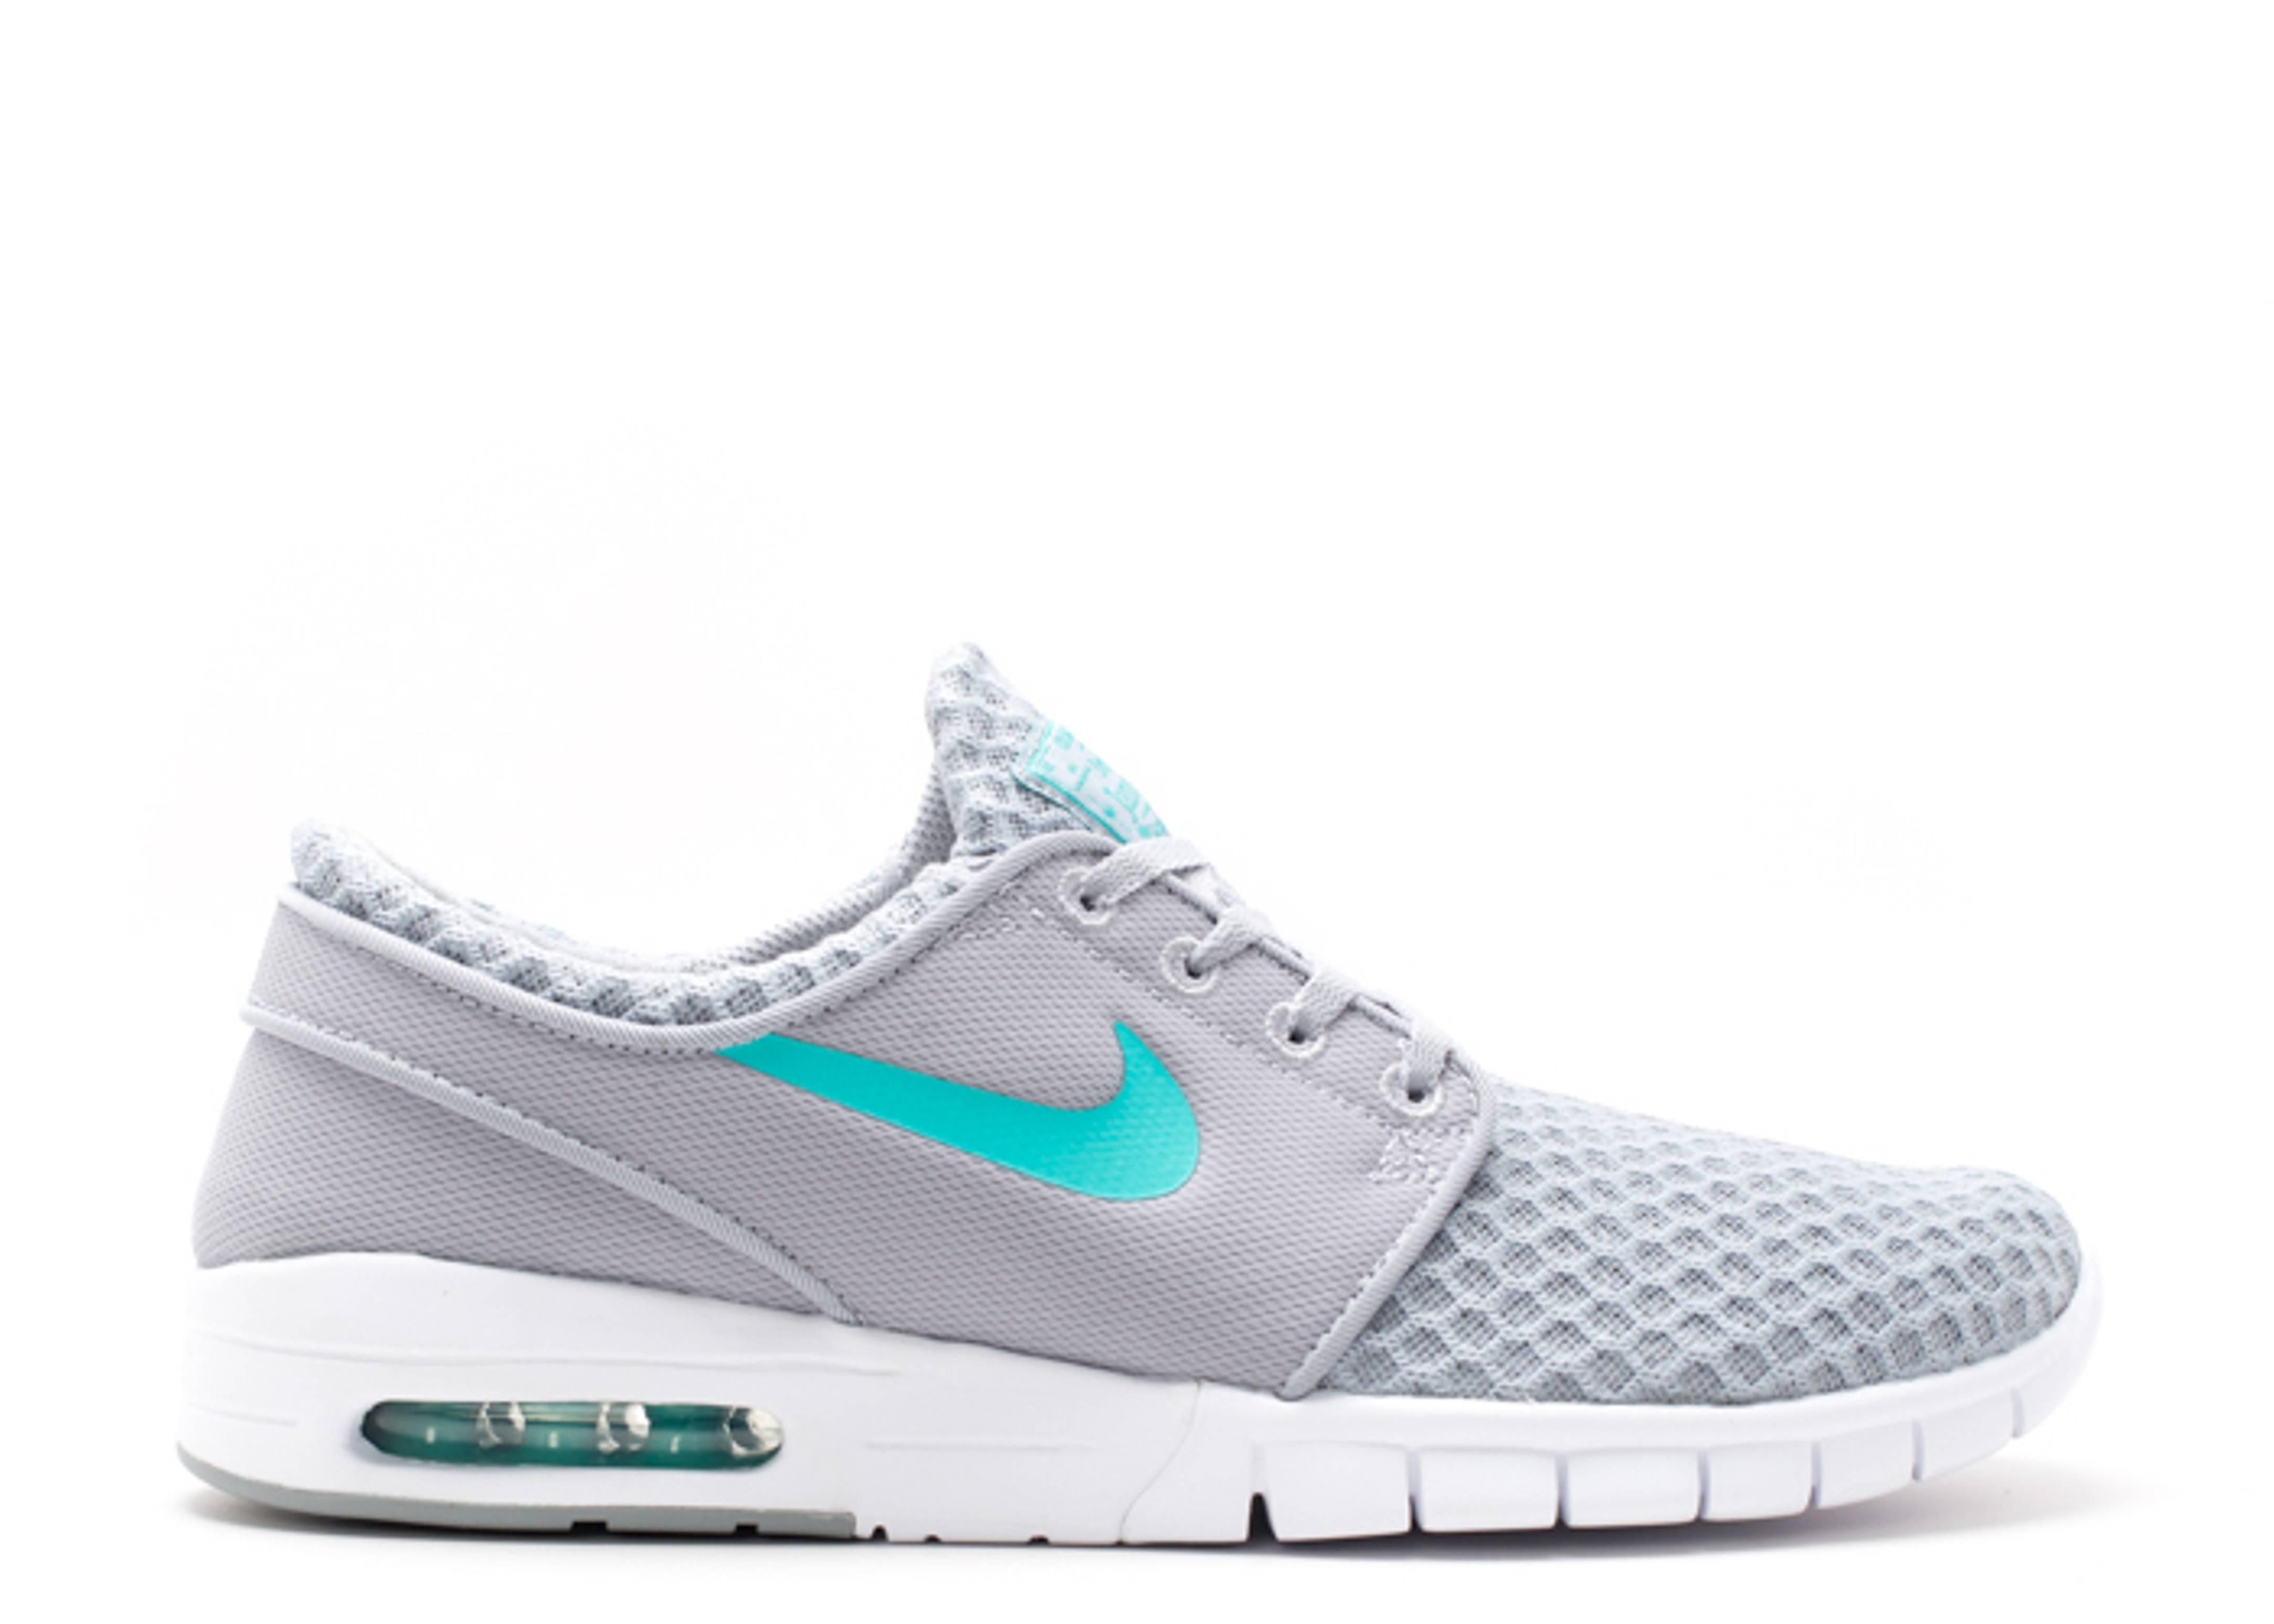 SB Stefan Janoski Max 'McFly' - Nike